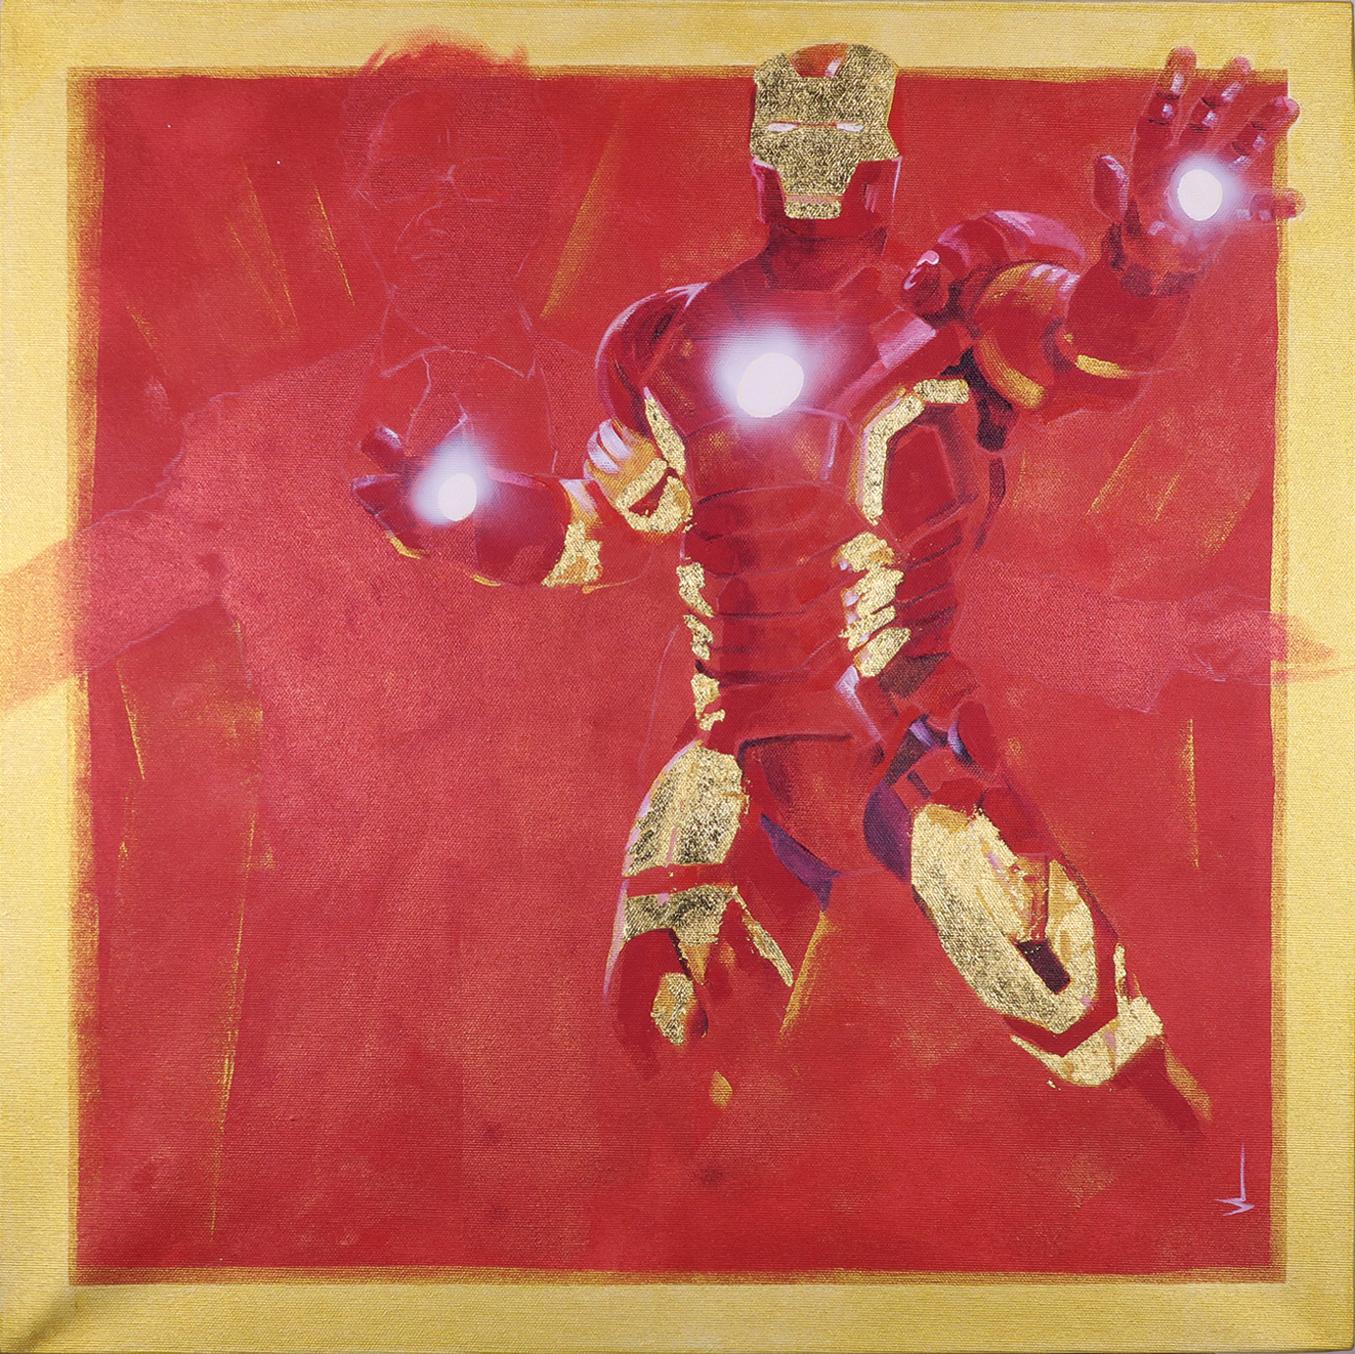 SH_Ironman_60x60_Acrylic_On_Canvas